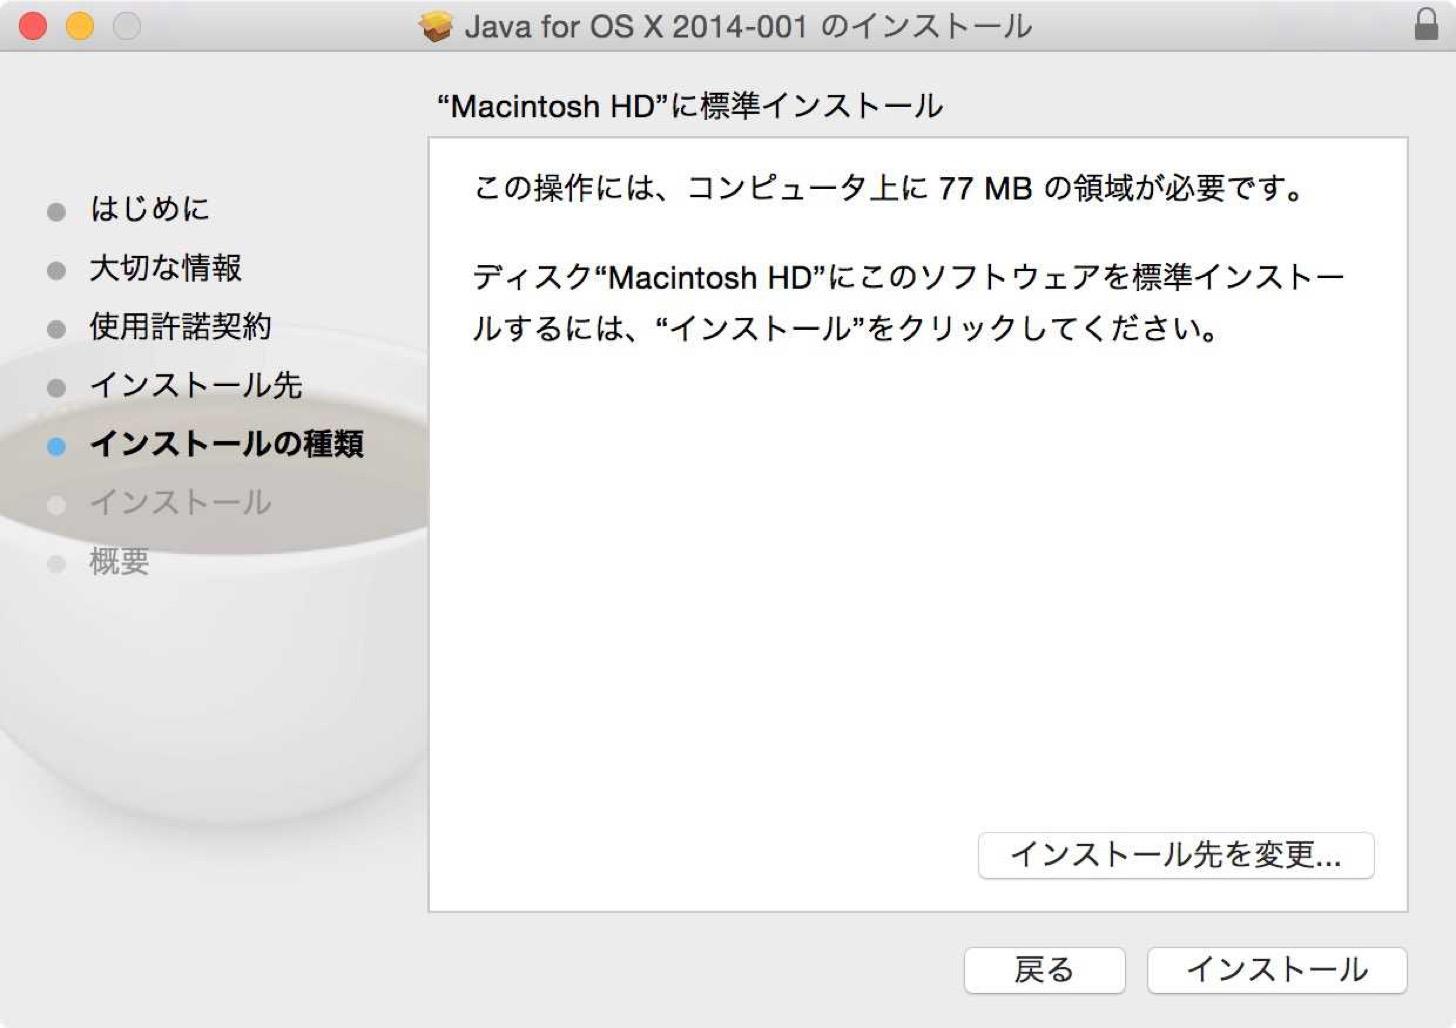 Macintosh HDに標準インストール